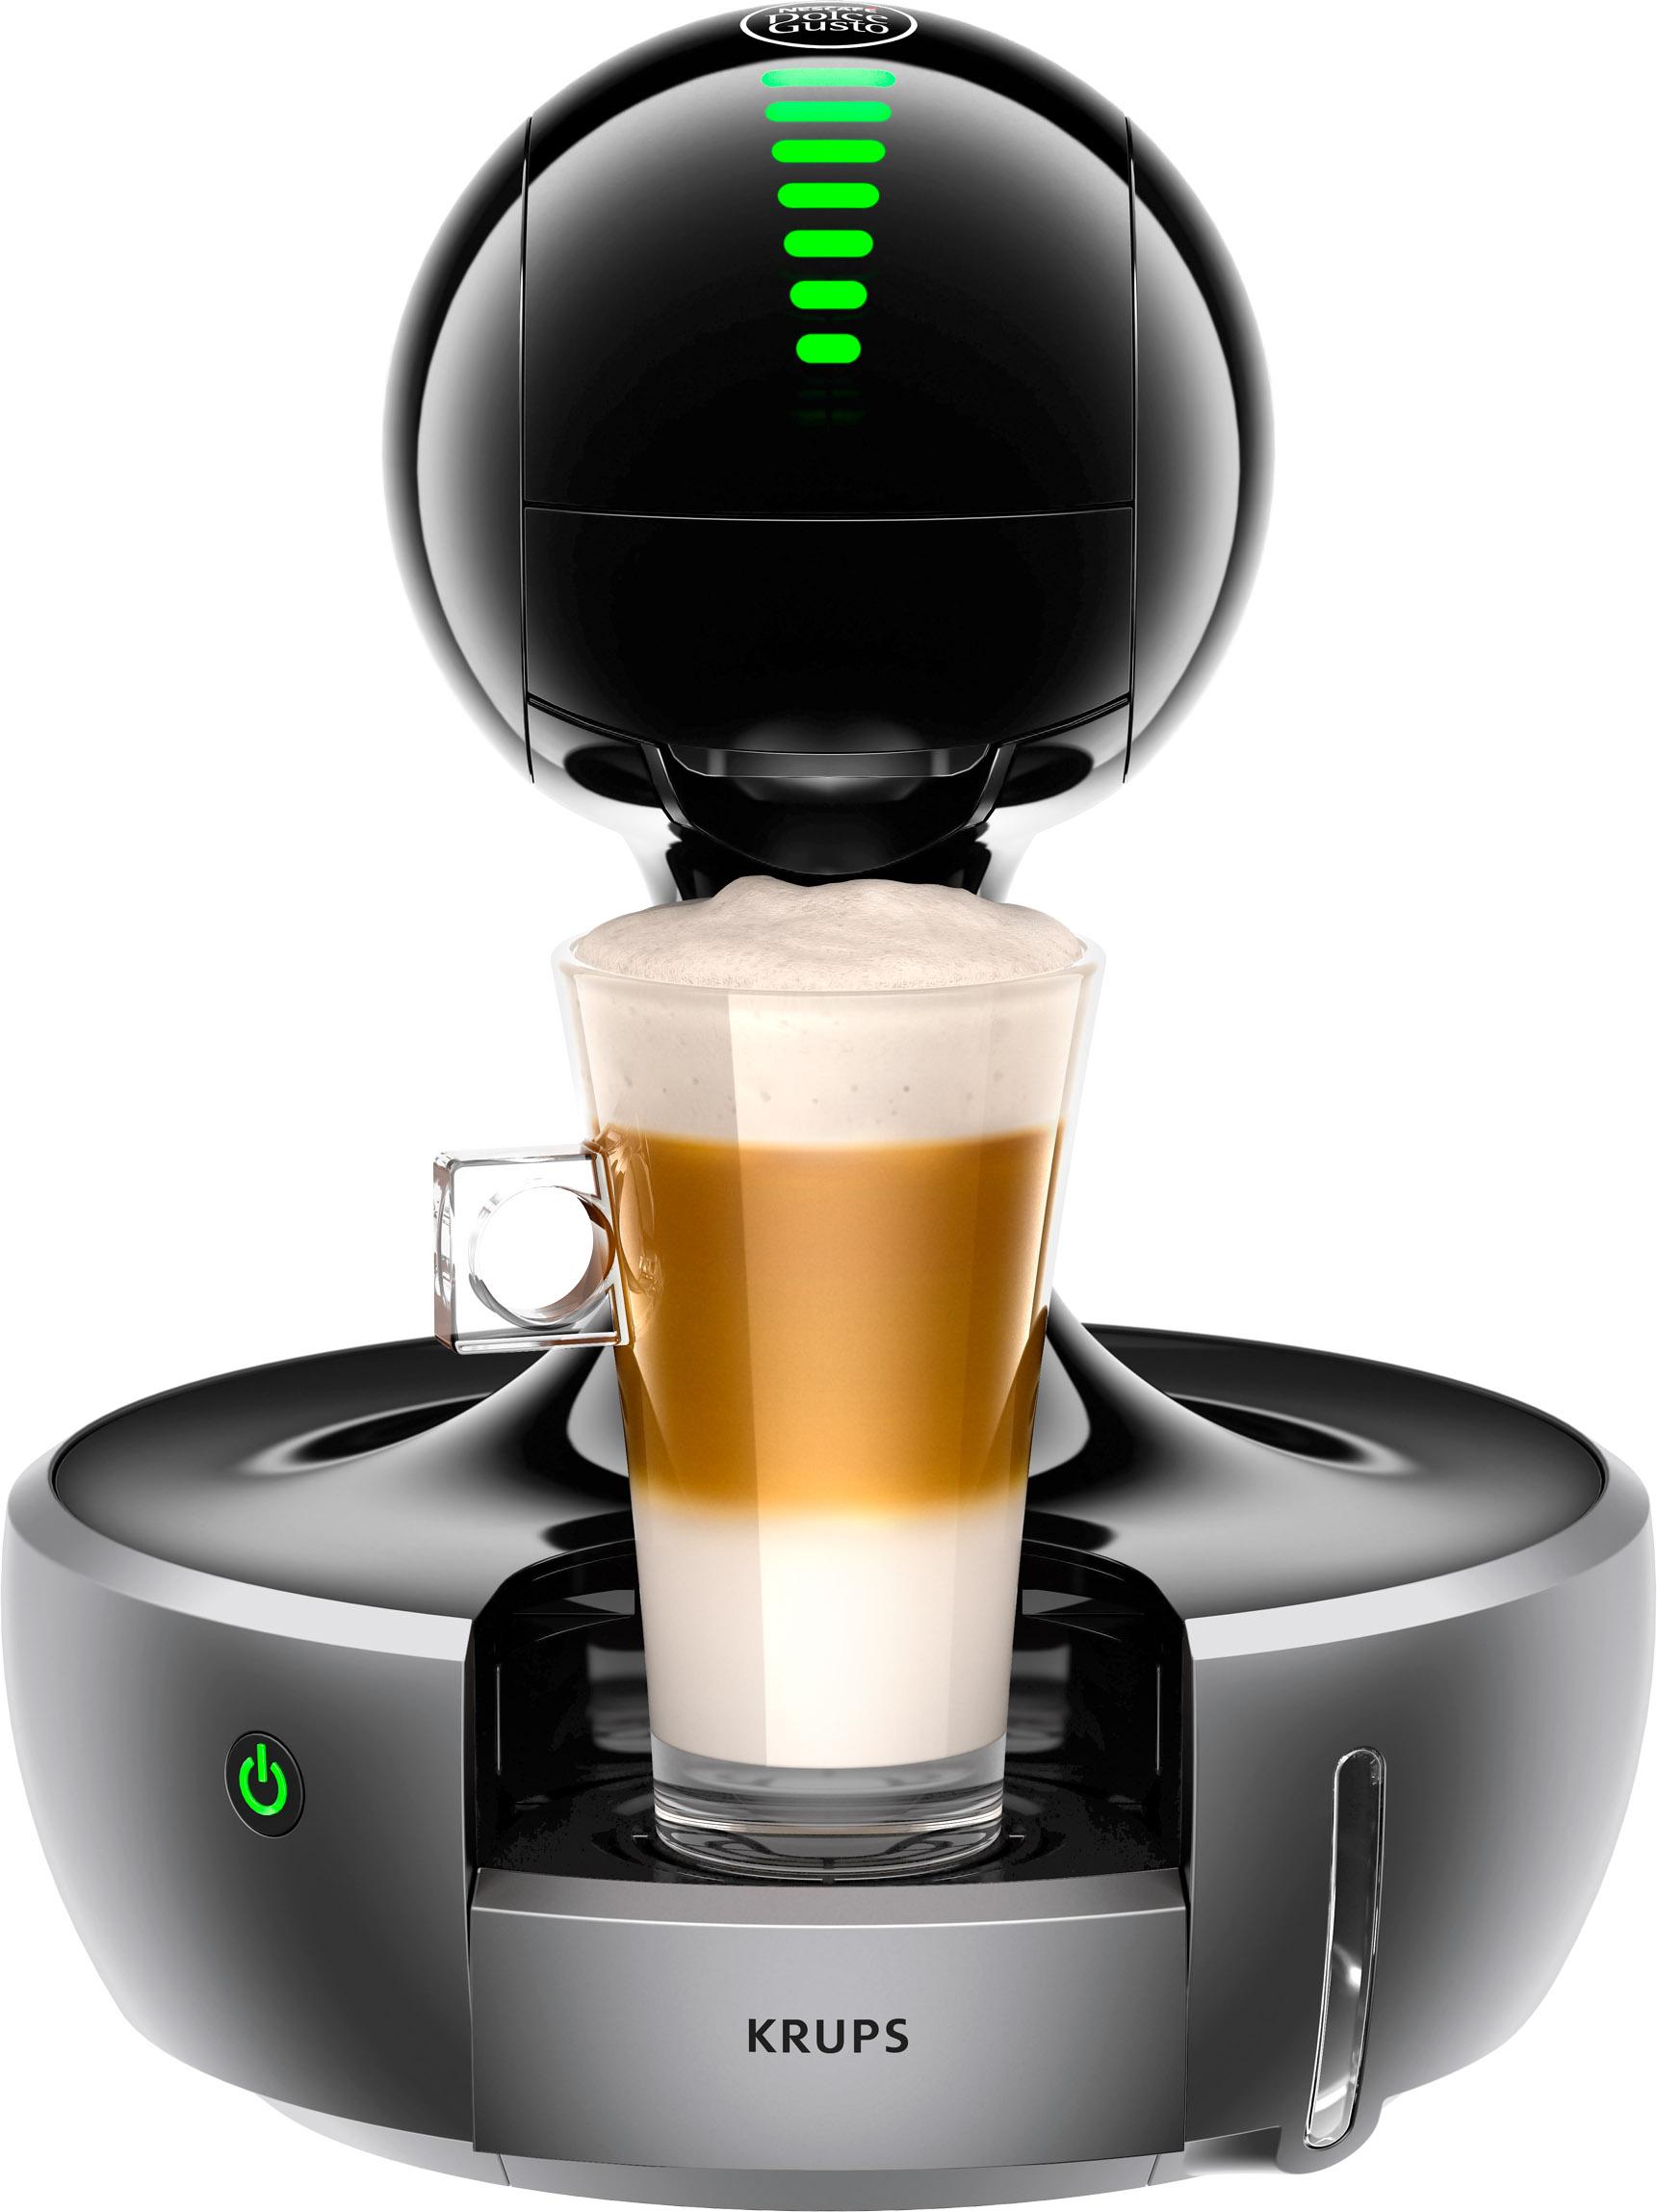 Krups KP350B10 капсульная кофемашина